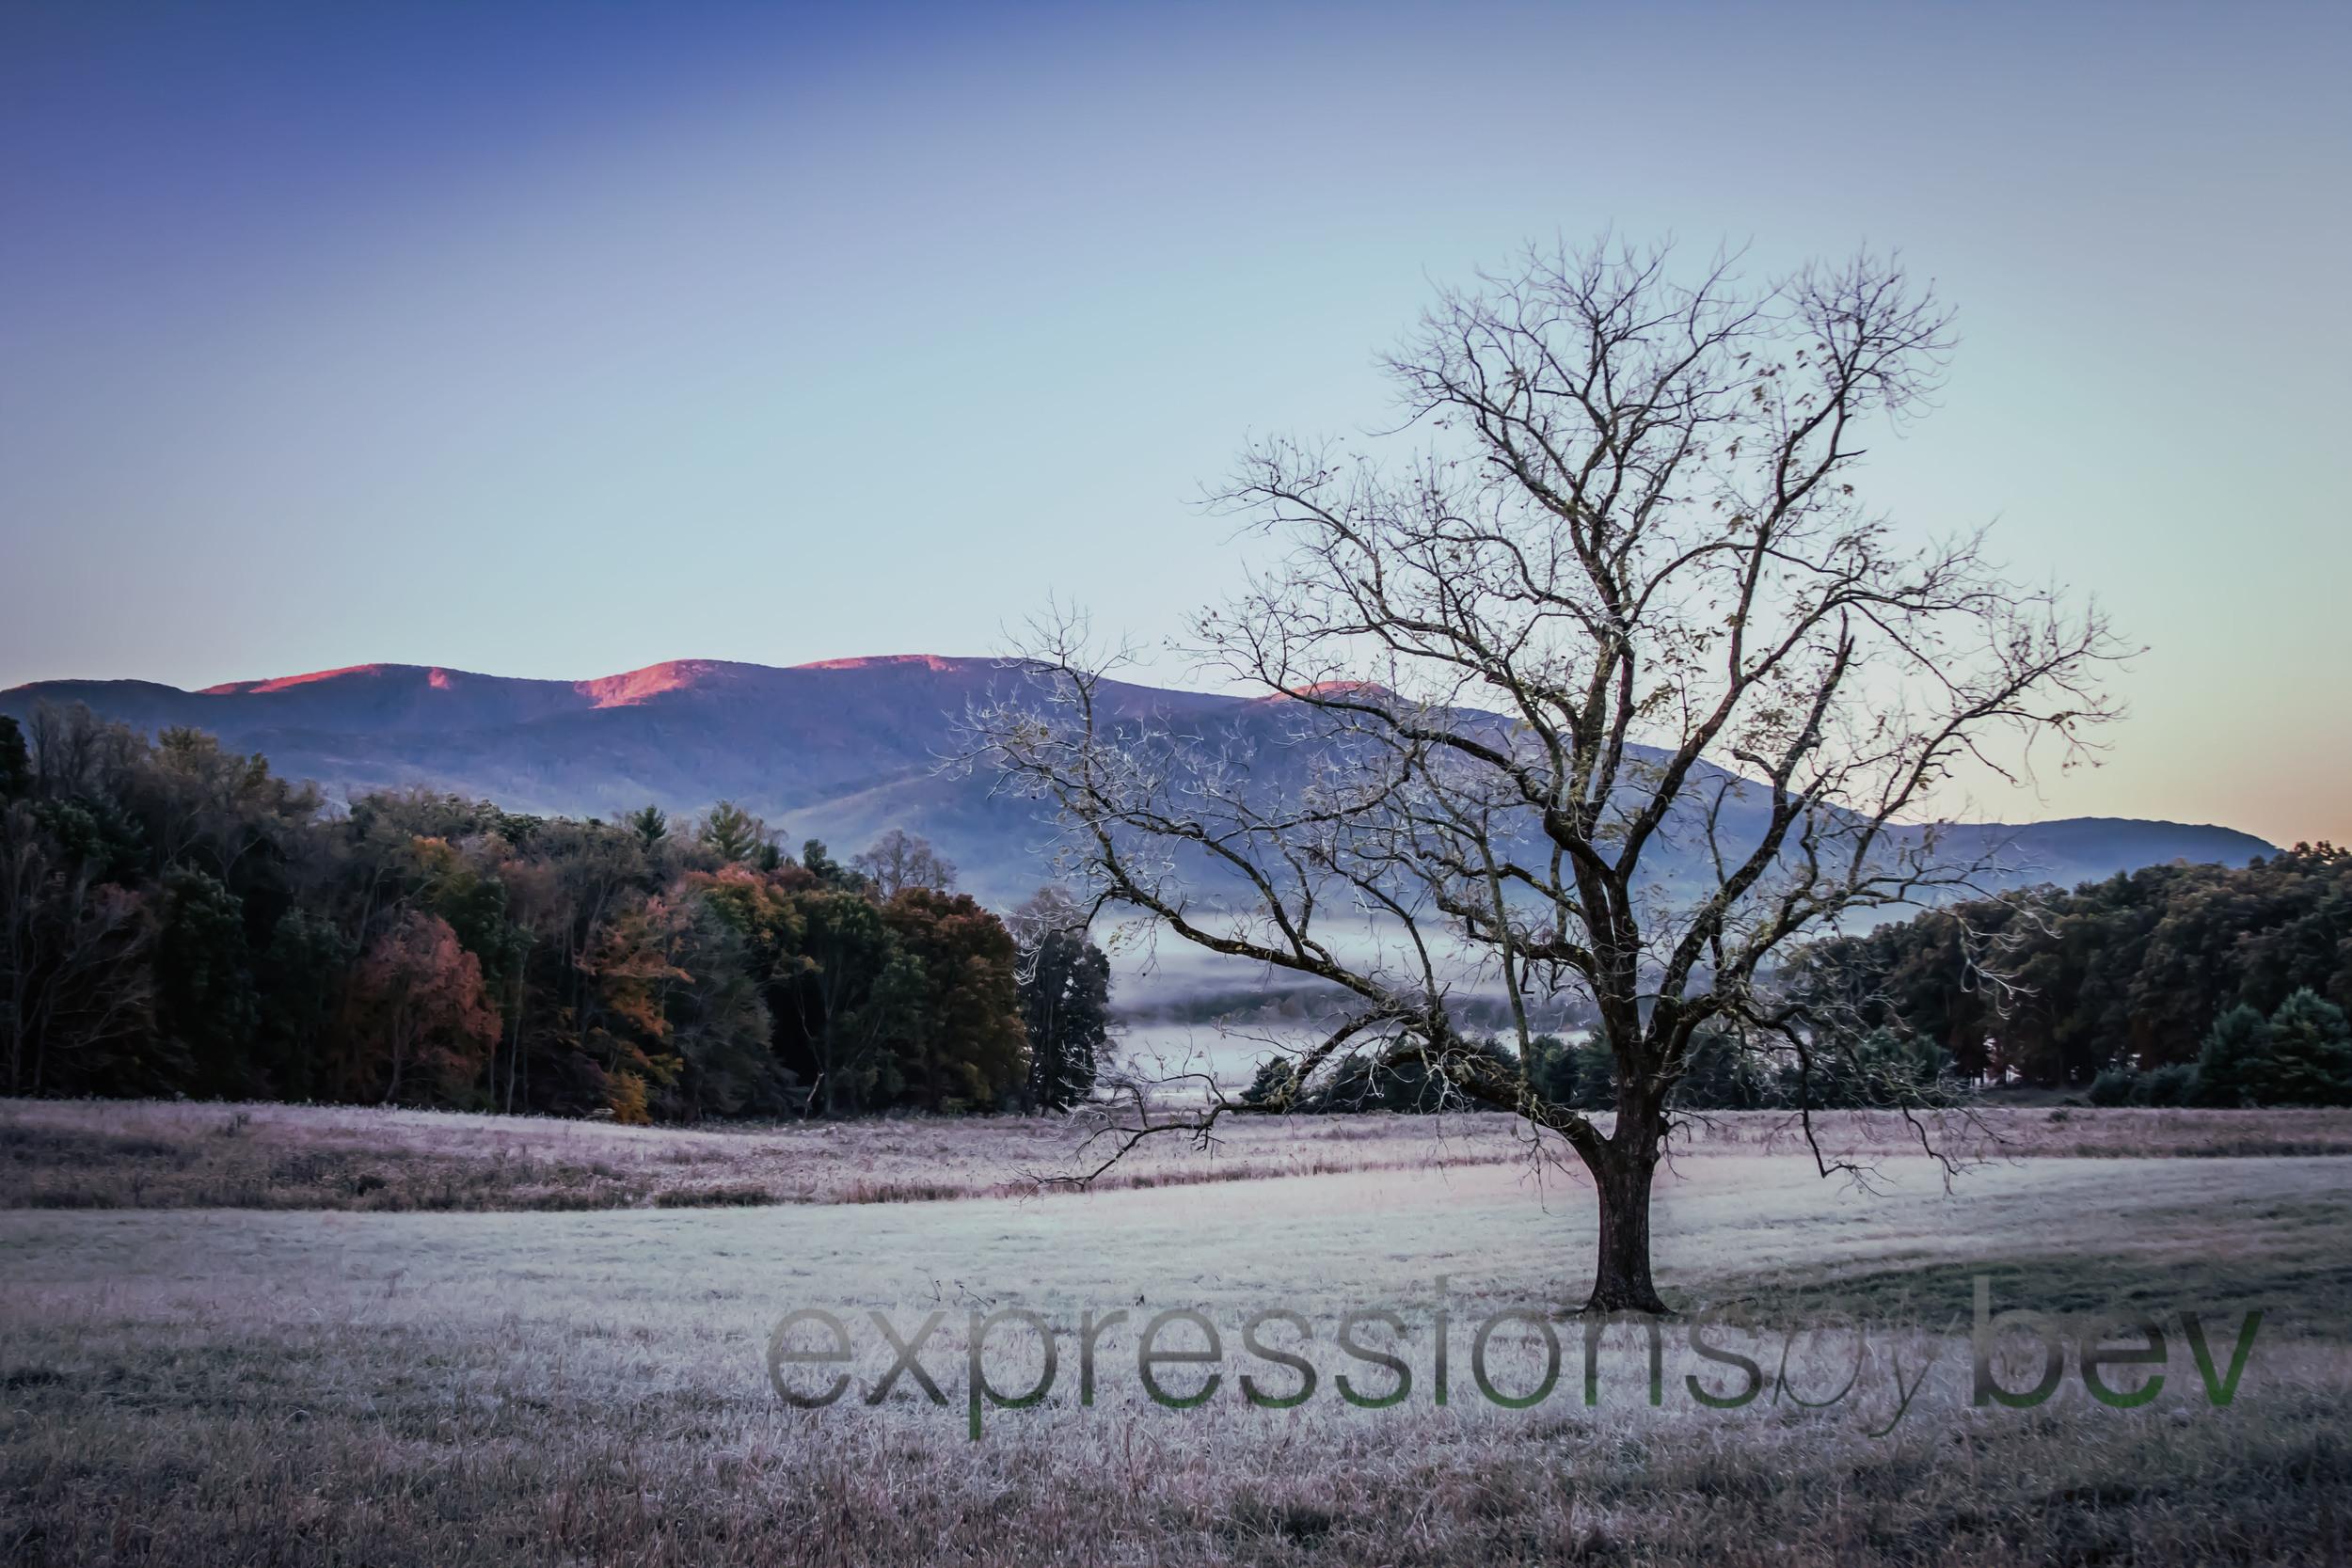 EBBev-2013-CNPA cades cove,treemont,roaring fork,sunrise,frost,spiderwebs,-3380-2_-41.jpg